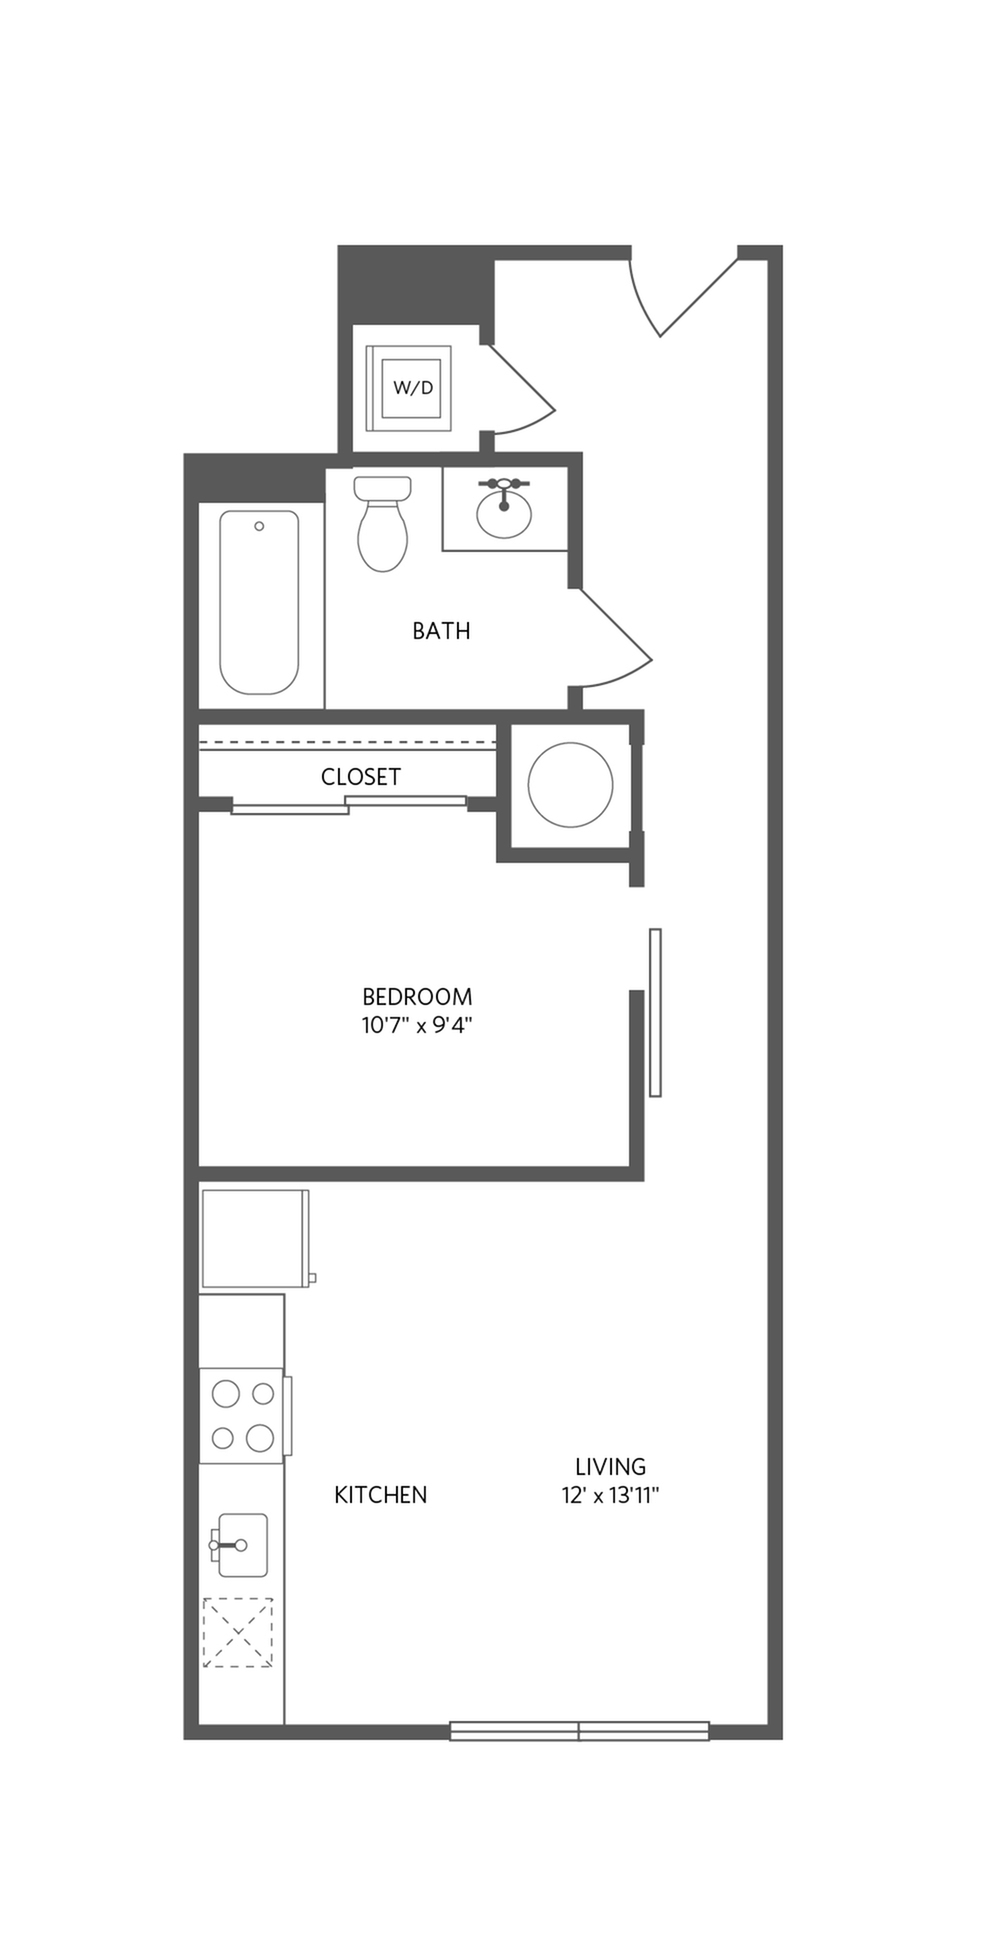 546 square foot one bedroom one bath apartment floorplan image